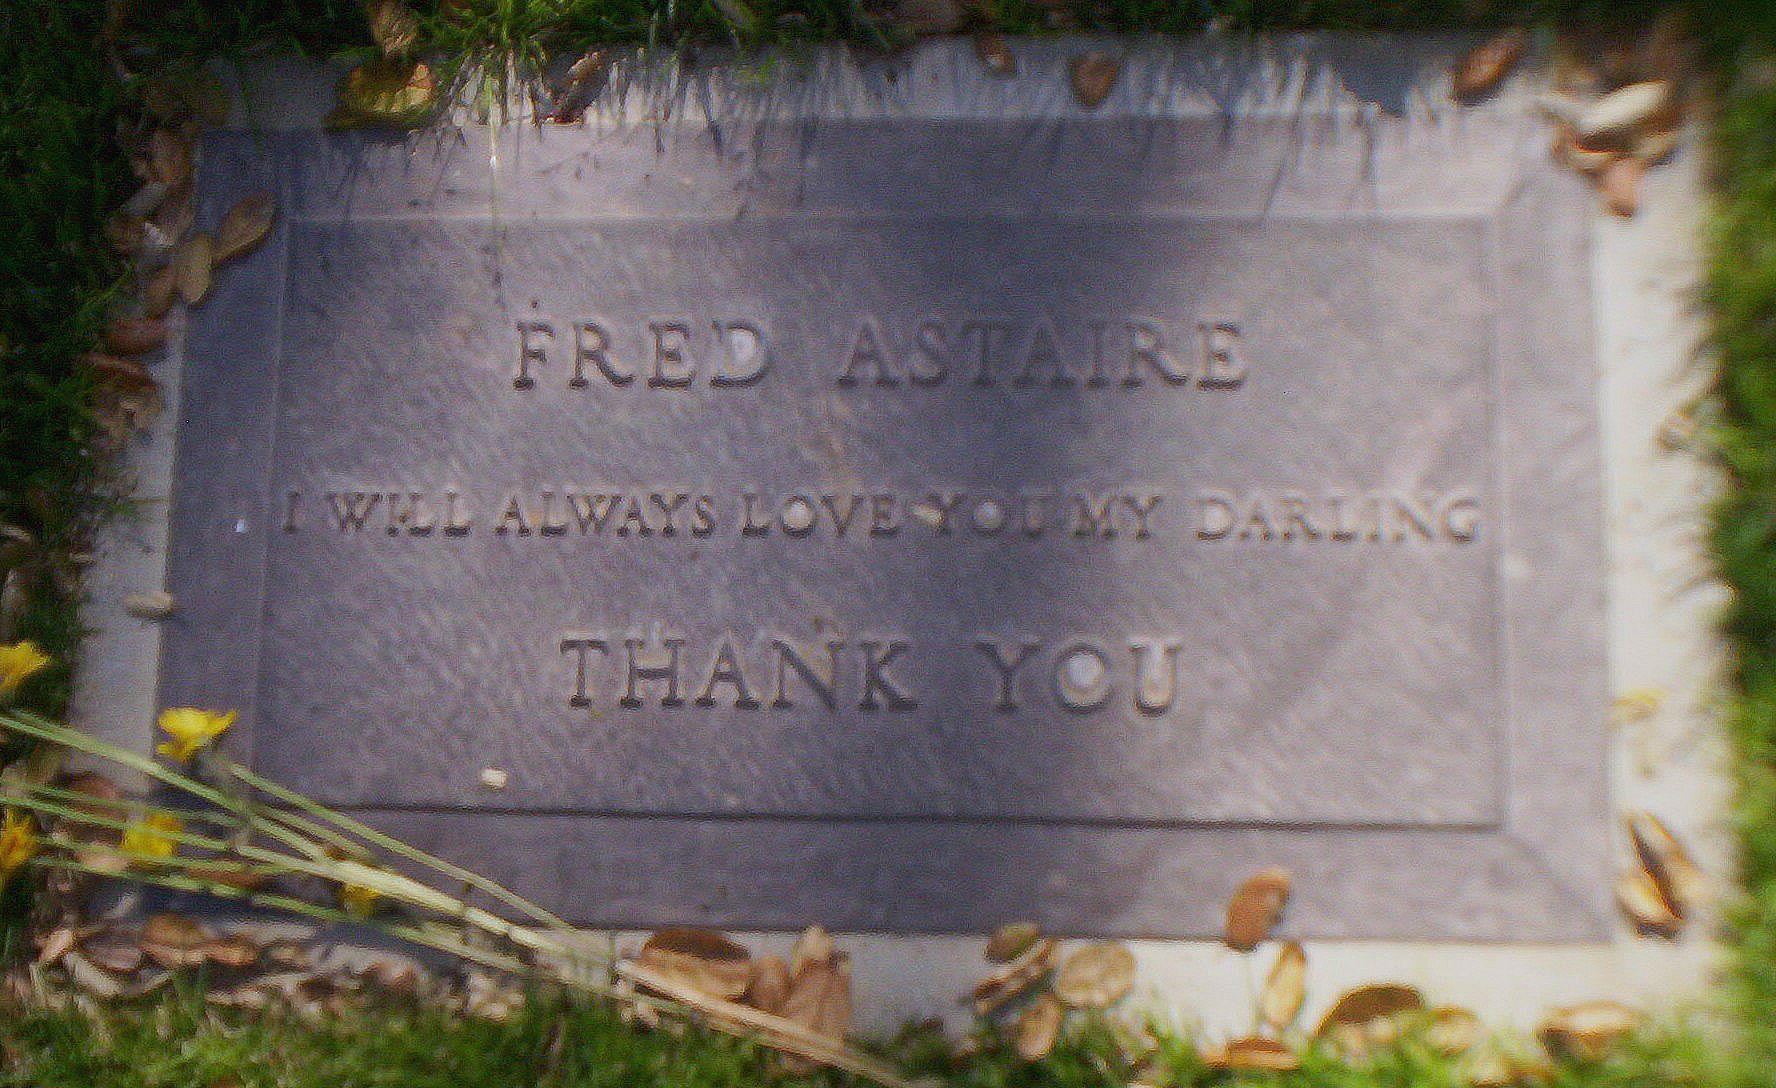 Seeing celebrities' graves at Los Angeles area cemeteries ...